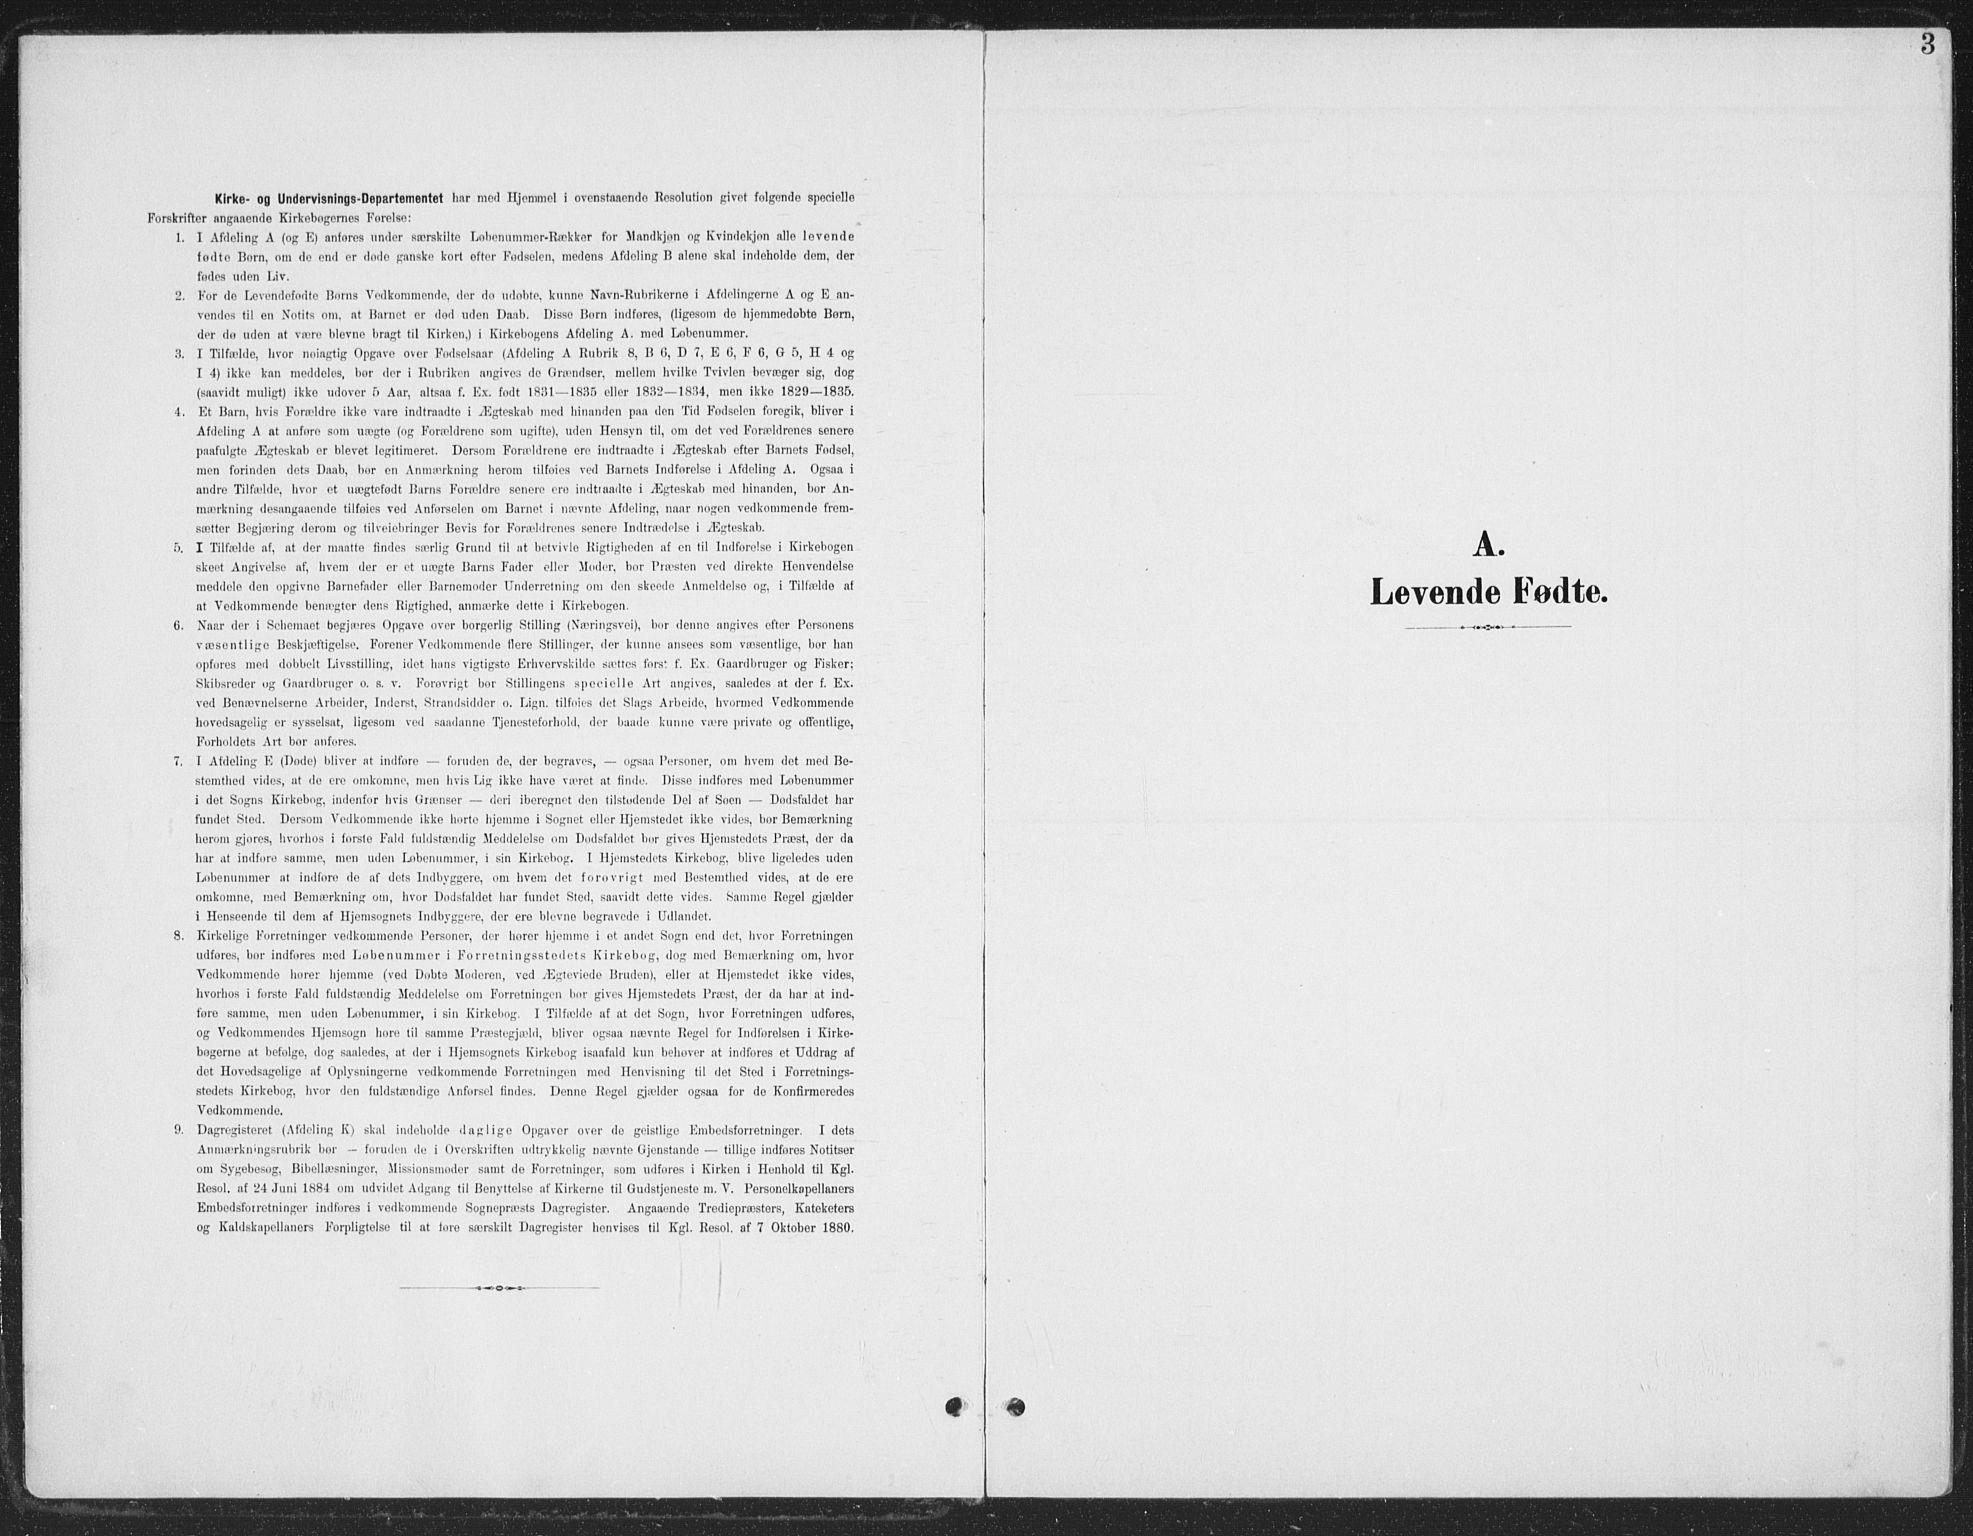 SAH, Østre Gausdal prestekontor, Ministerialbok nr. 5, 1902-1920, s. 3